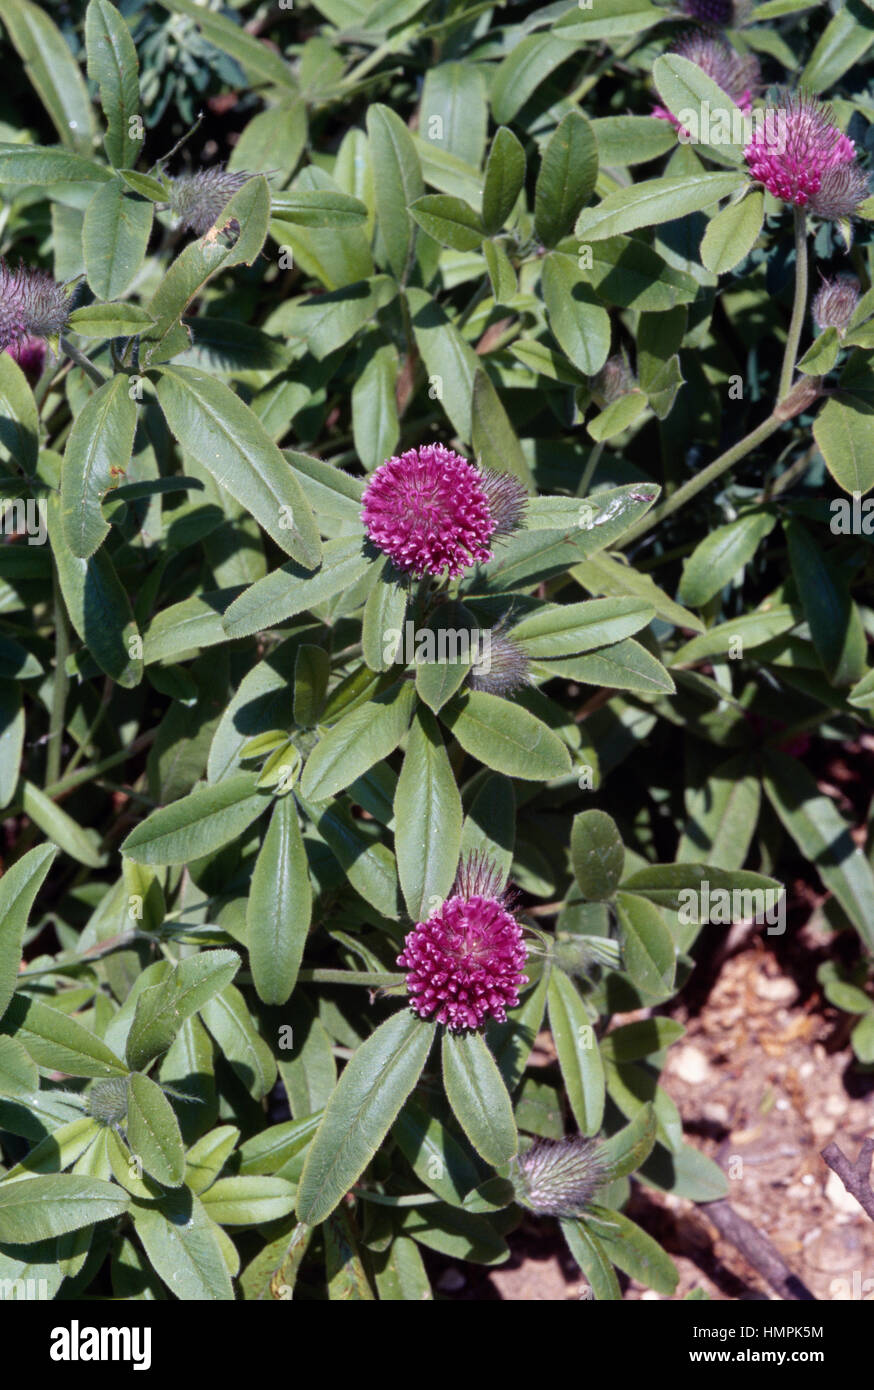 Purple-globe clover (Trifolium alpestre), Fabaceae. - Stock Image